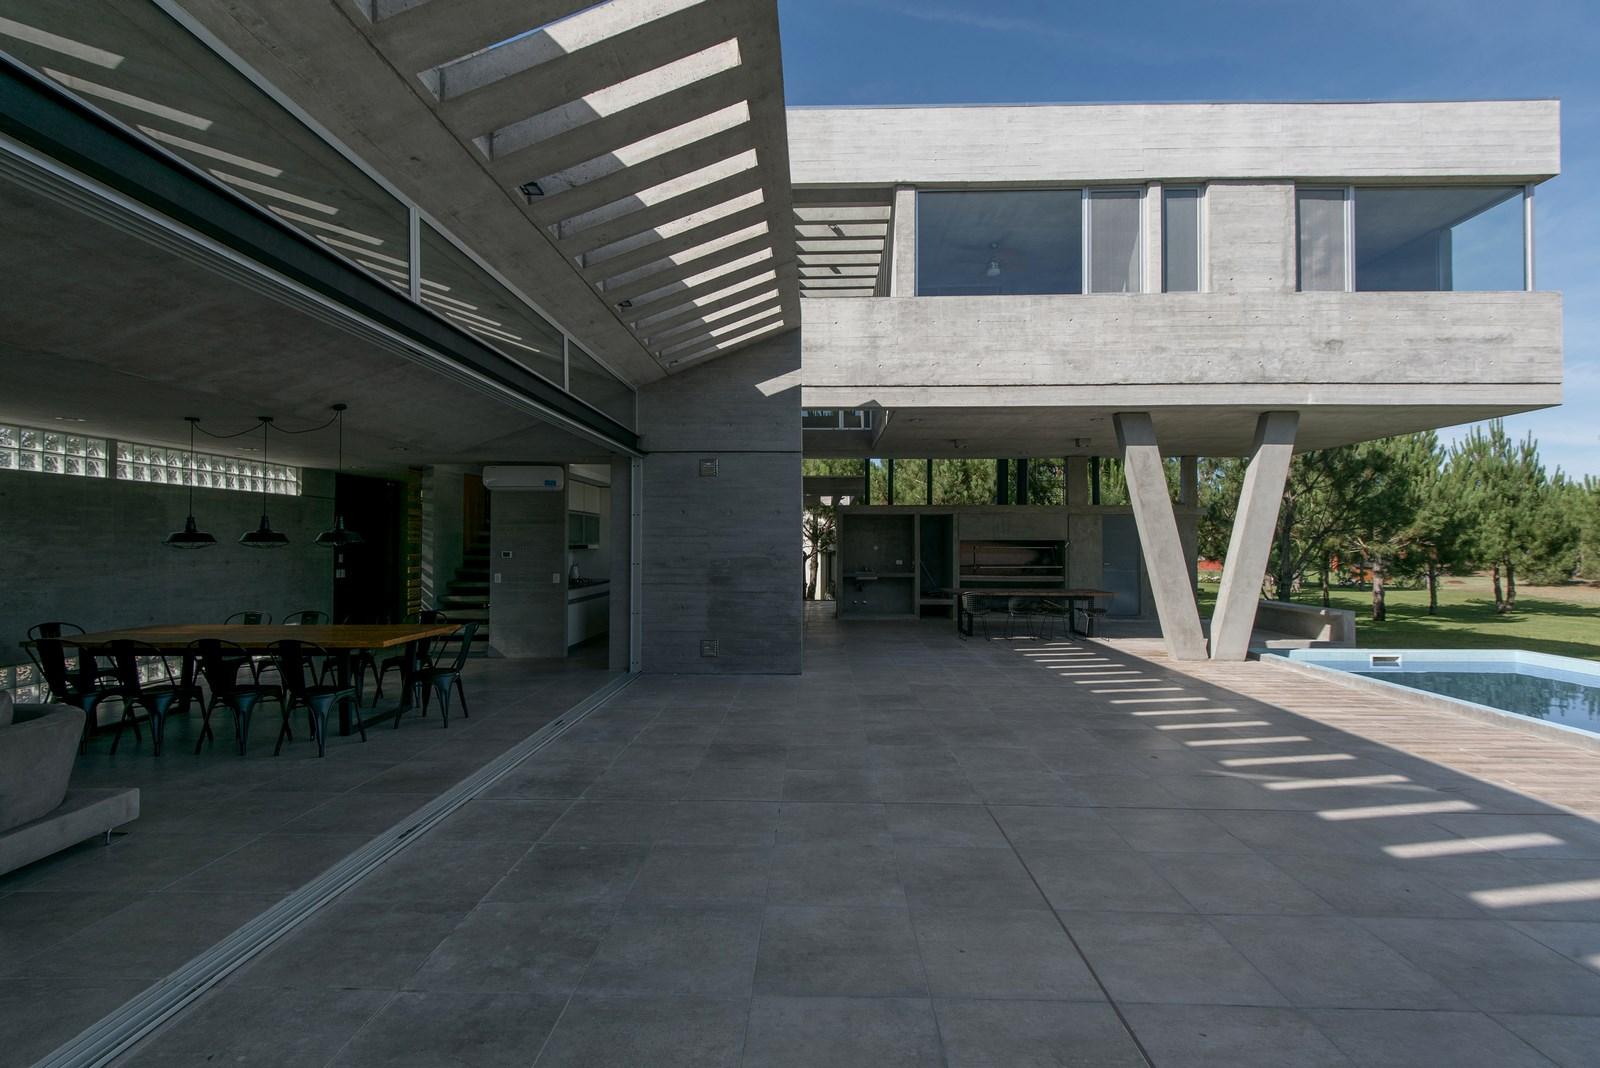 Casa AYYA - Estudio Galera - Foto © Diego Medina 025 (Copy)